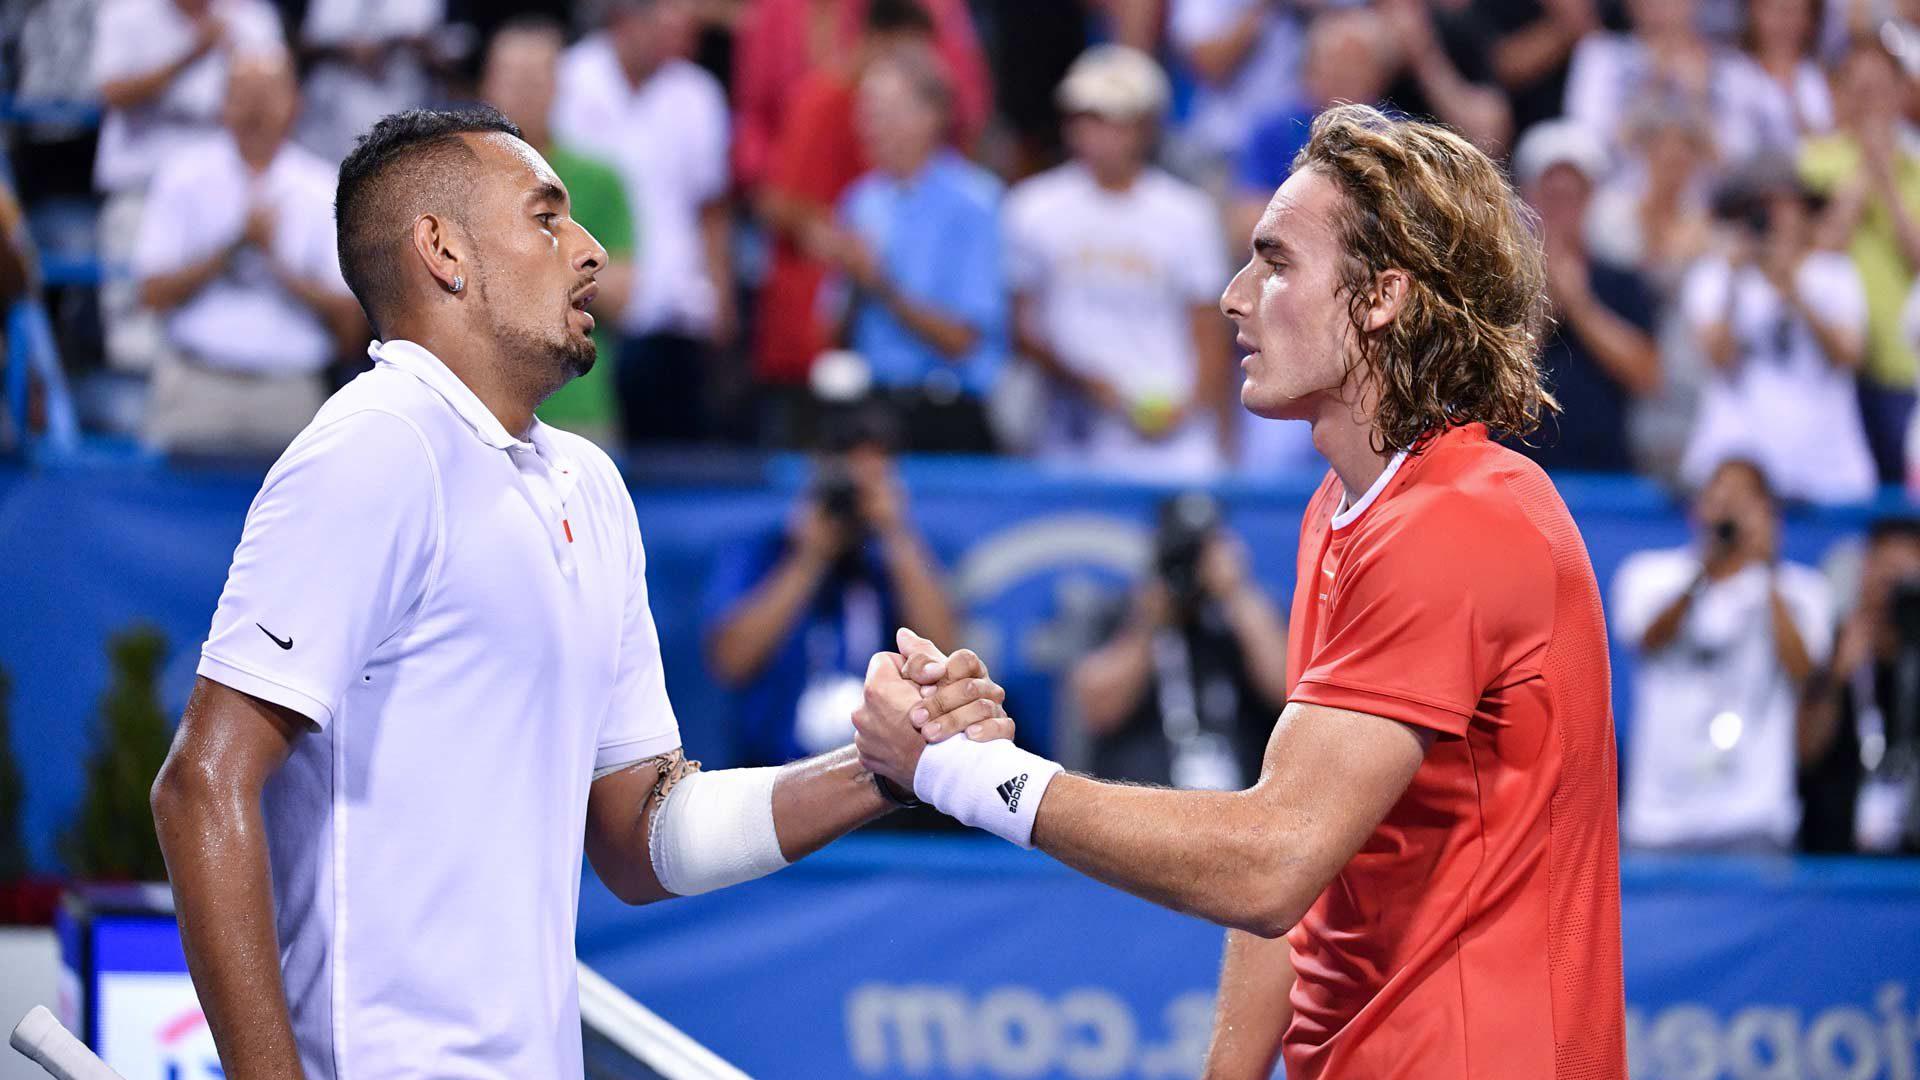 ATP գավաթ. Ցիցիպաս-Կիրիոս գերհավասար պայքարում հաղթեց ավստրալացին